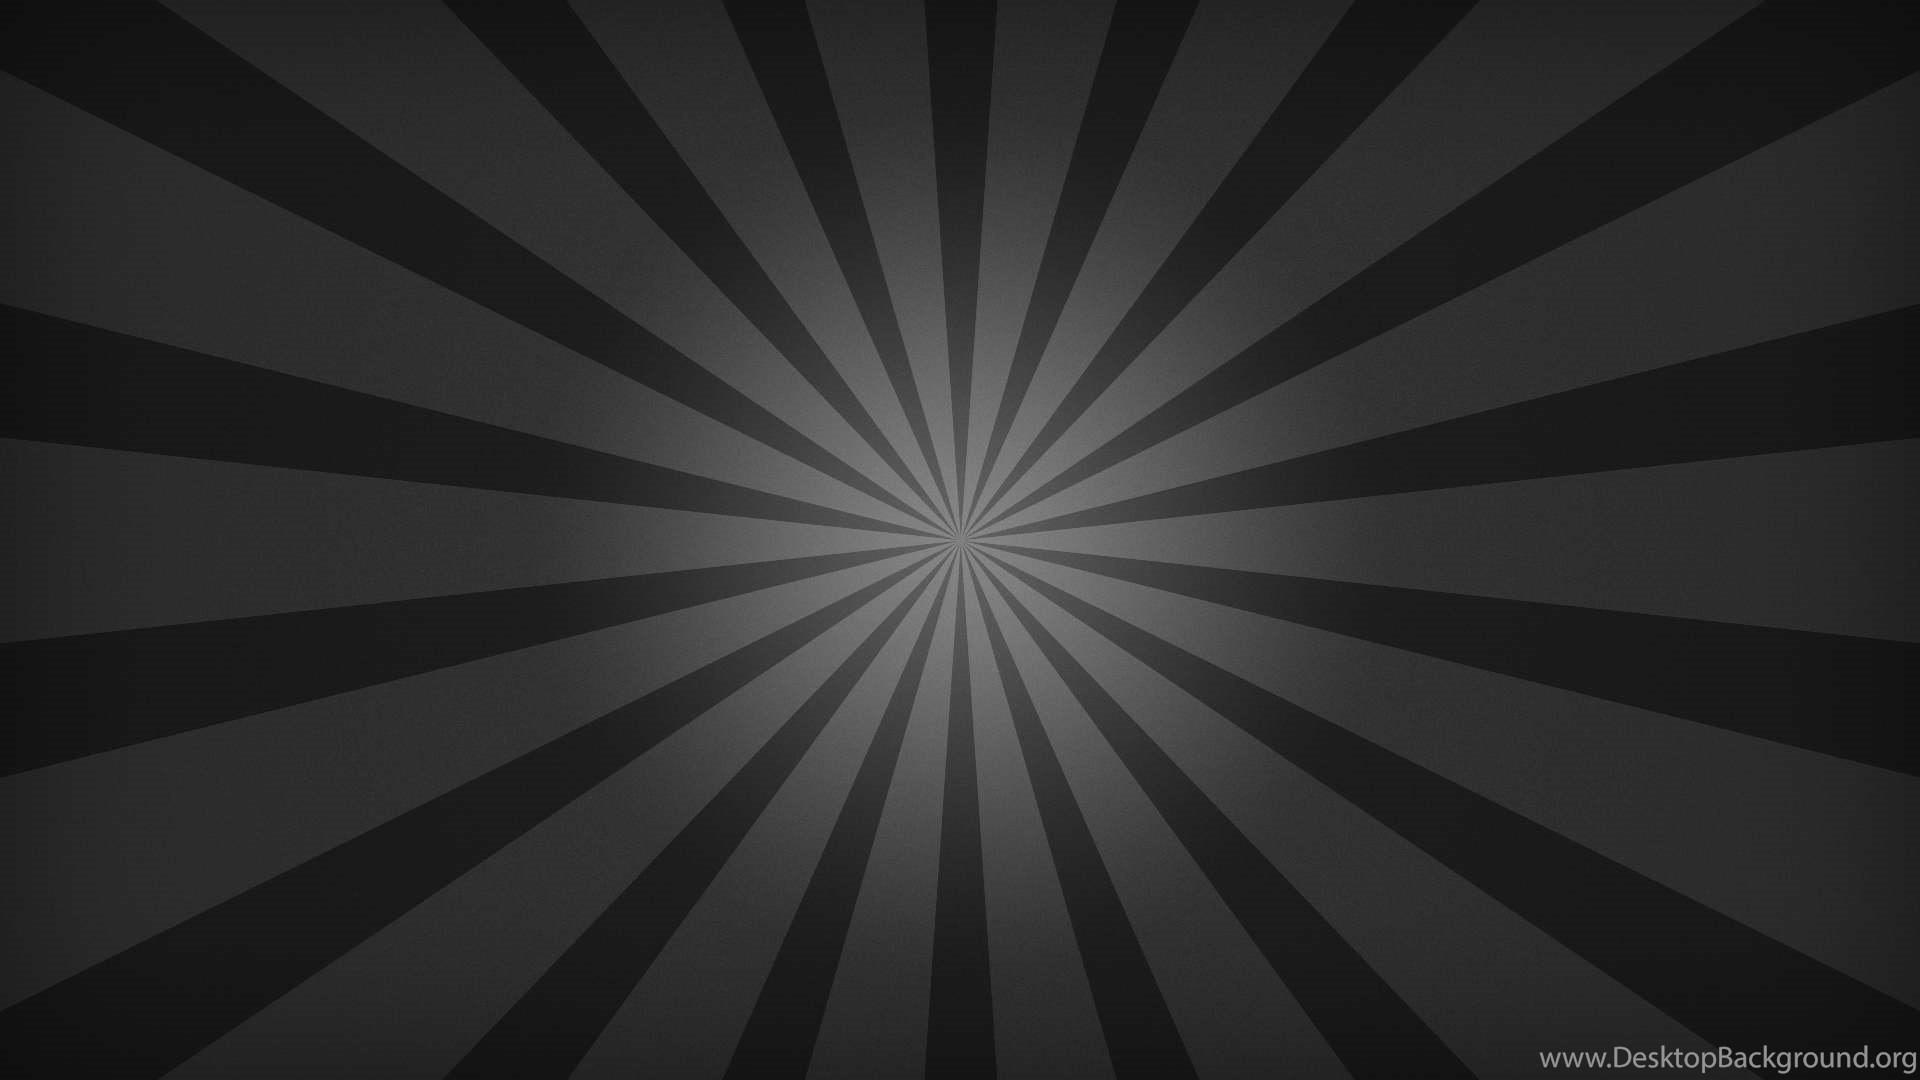 Sunburst Desktop Wallpapers Toptenpackcom